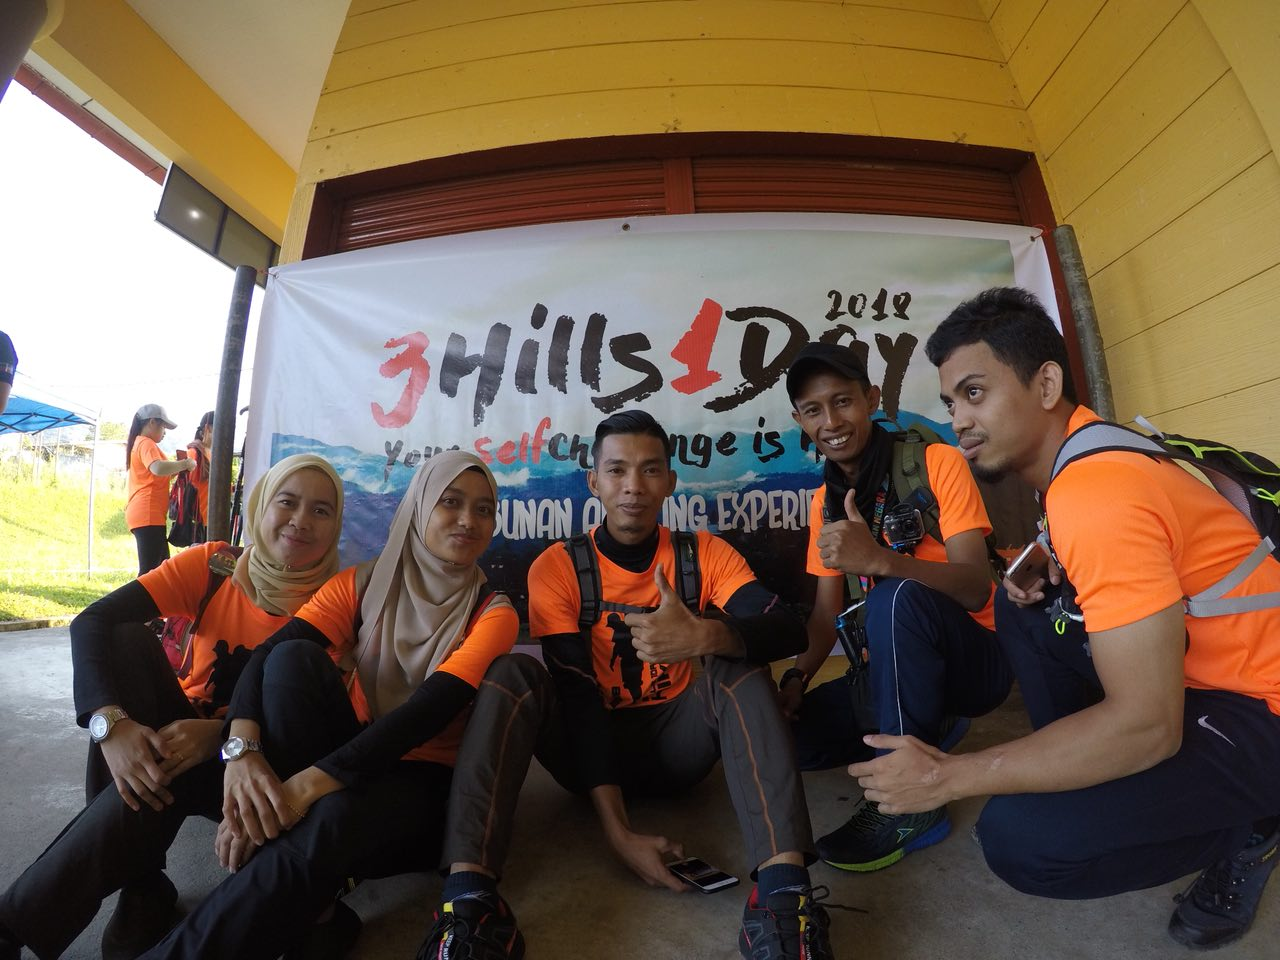 3Hills1Day